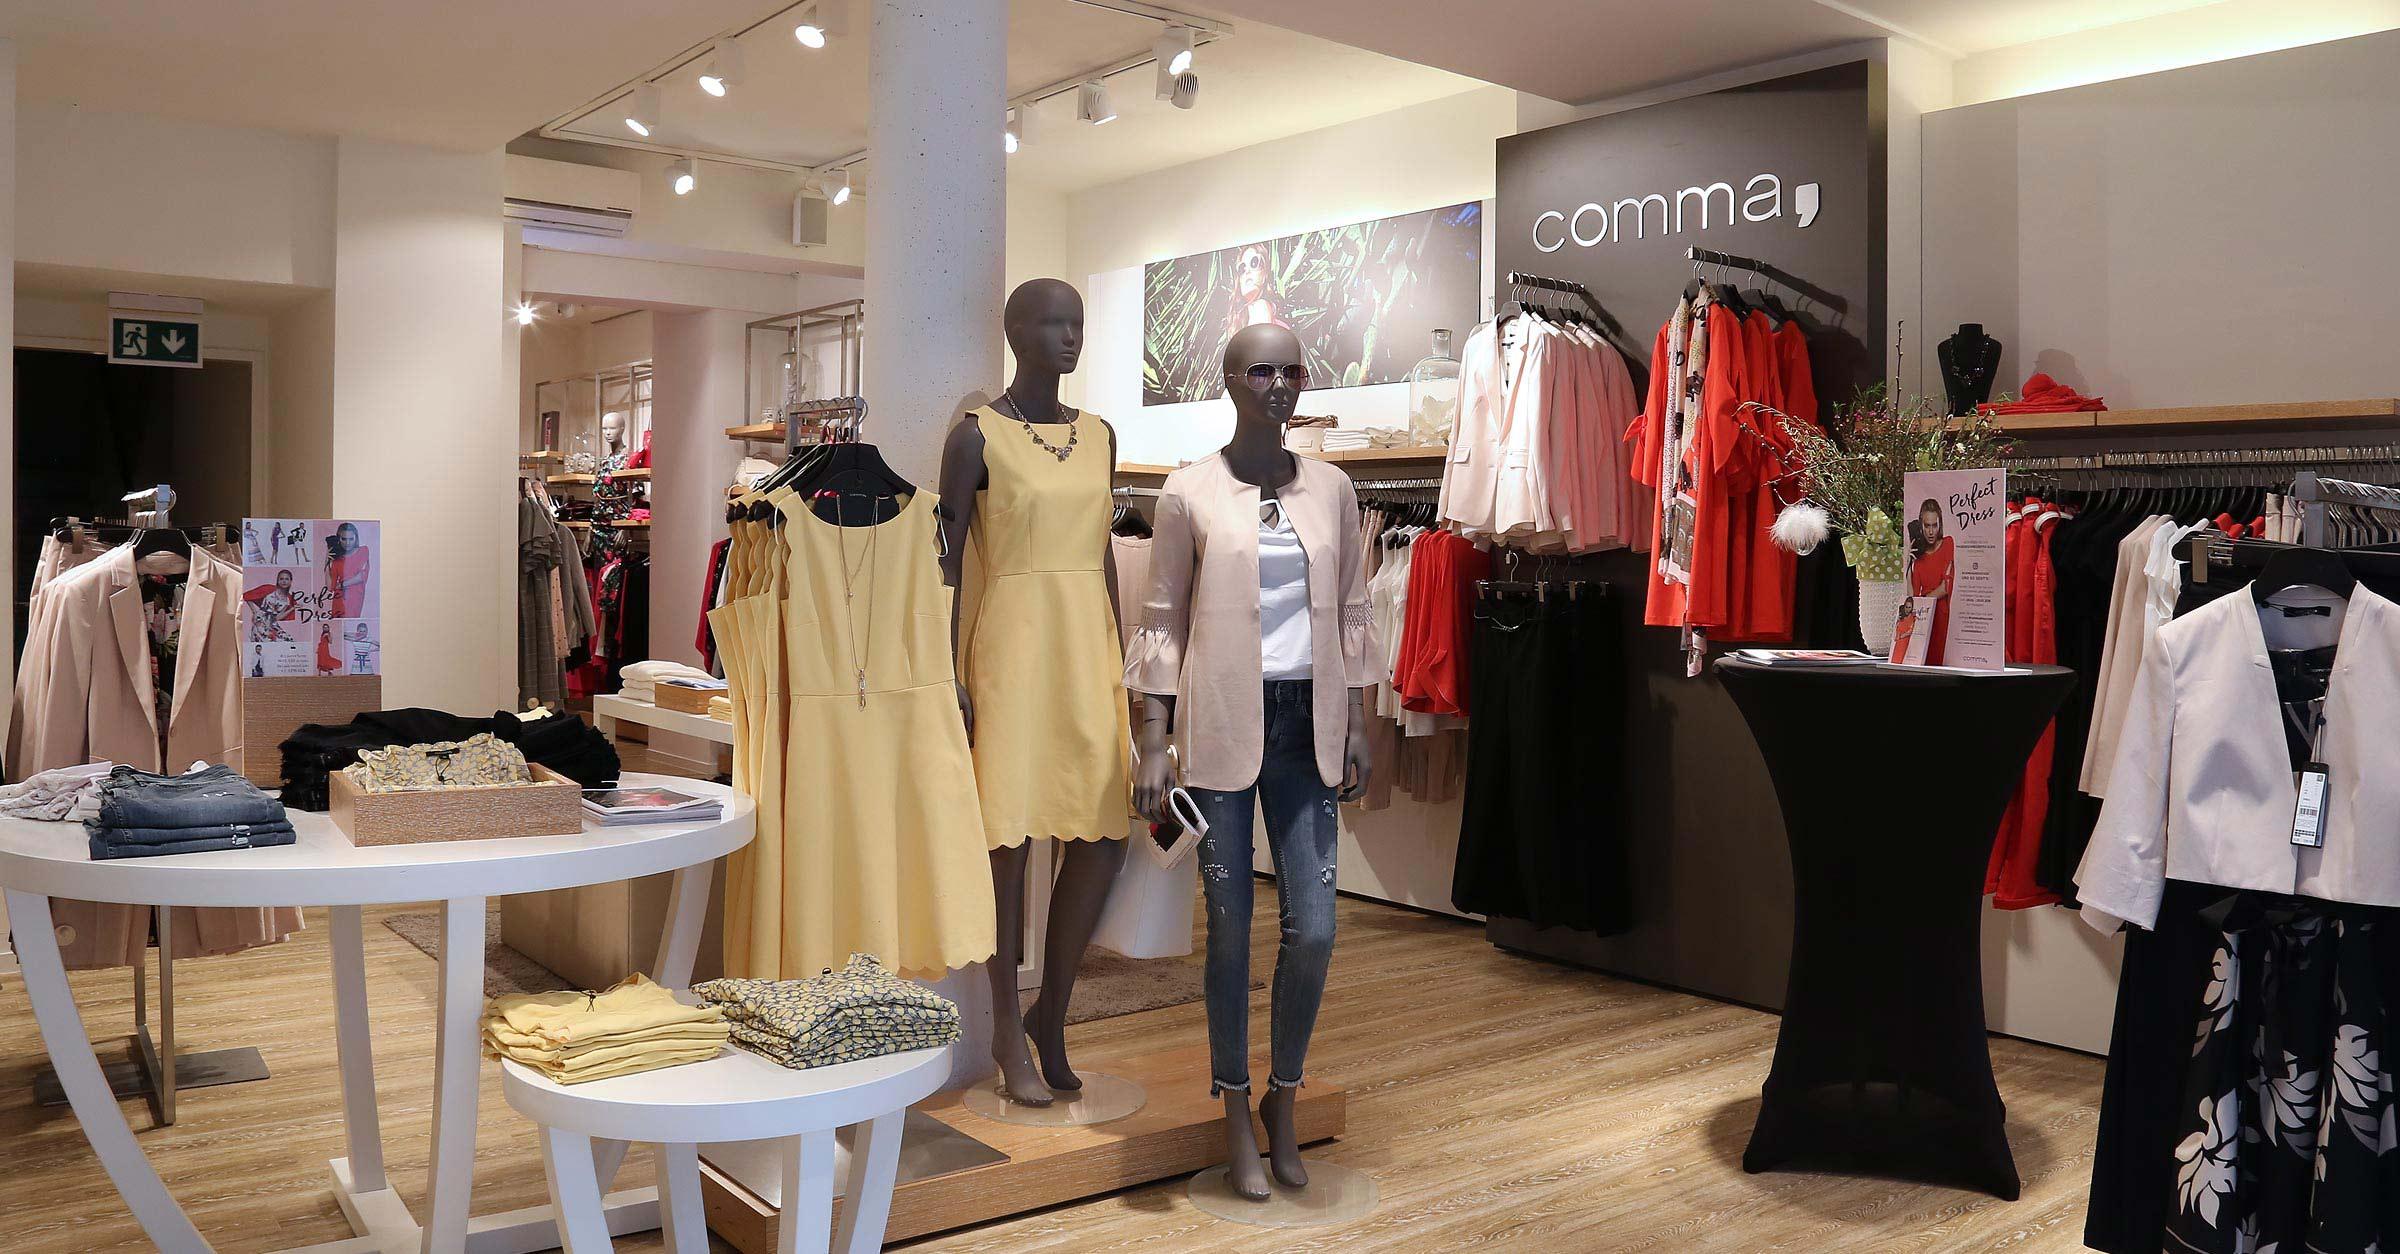 Comma Store Heilbronn - Abendmode